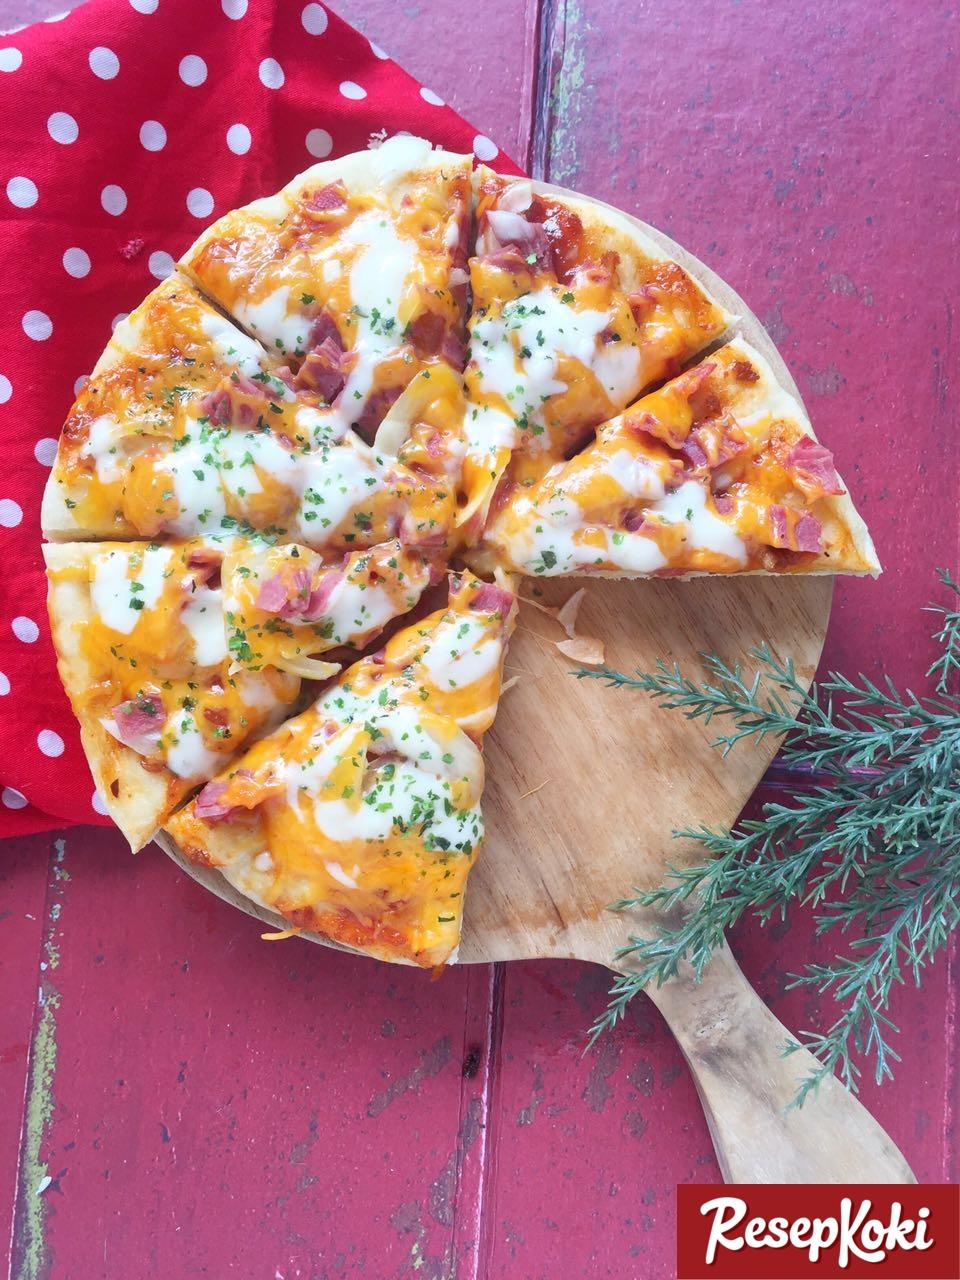 Resep Pizza Teflon Resep Indonesia CaraBiasa.com